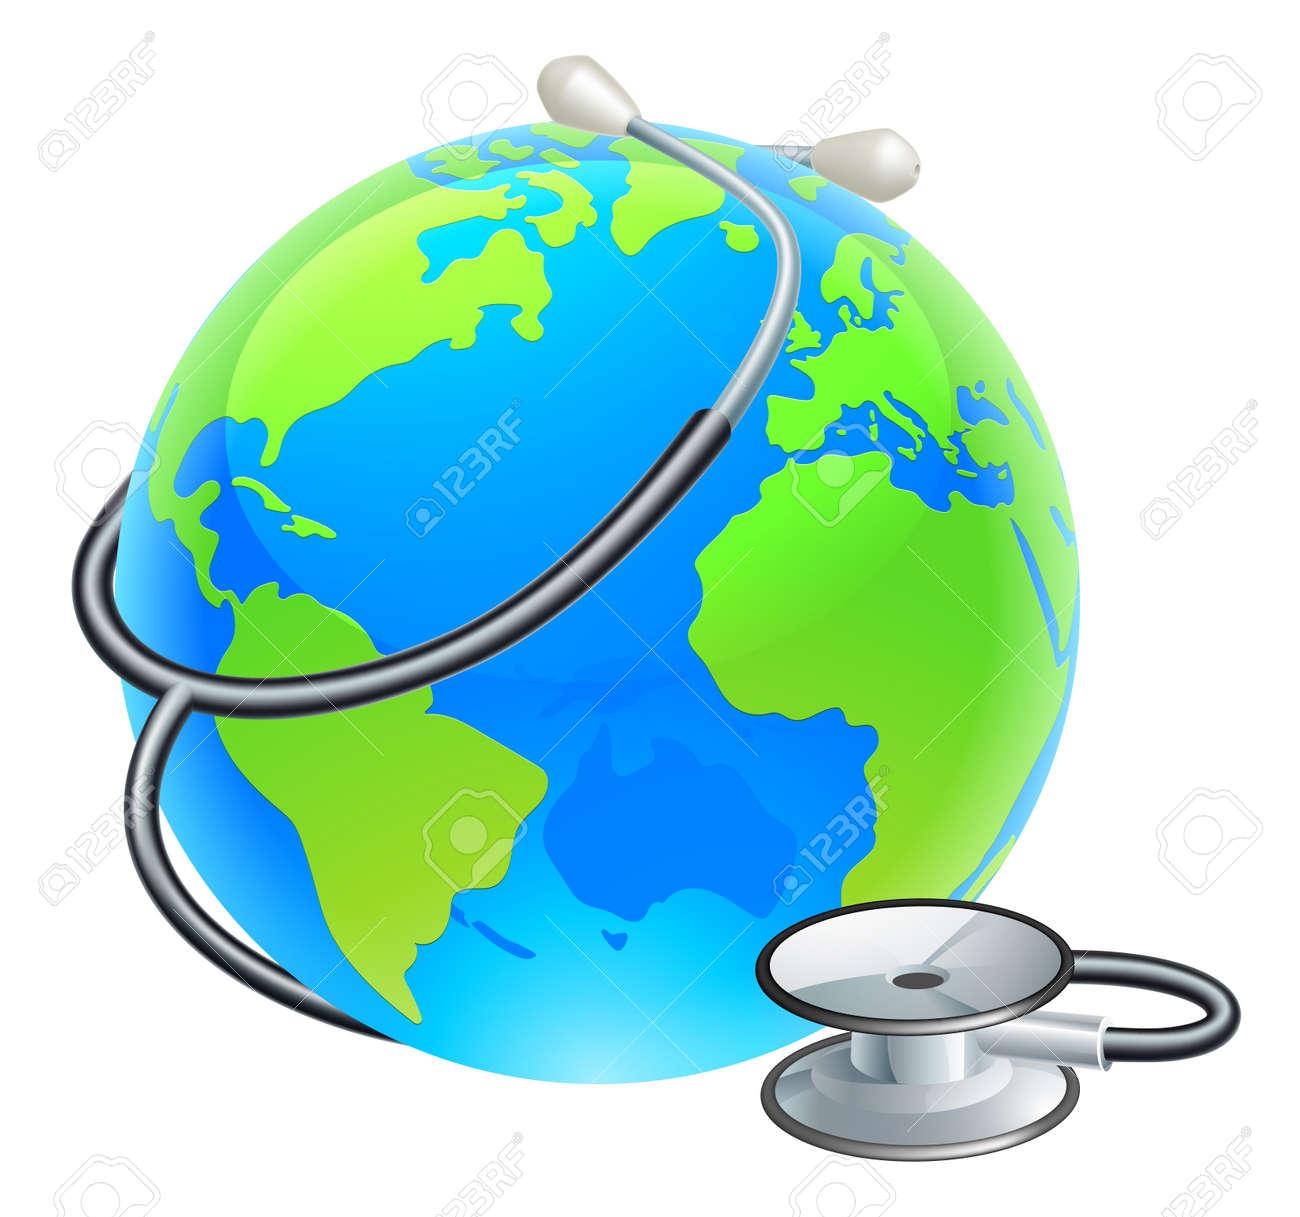 Earth World Globe With Stethoscope - 146239438